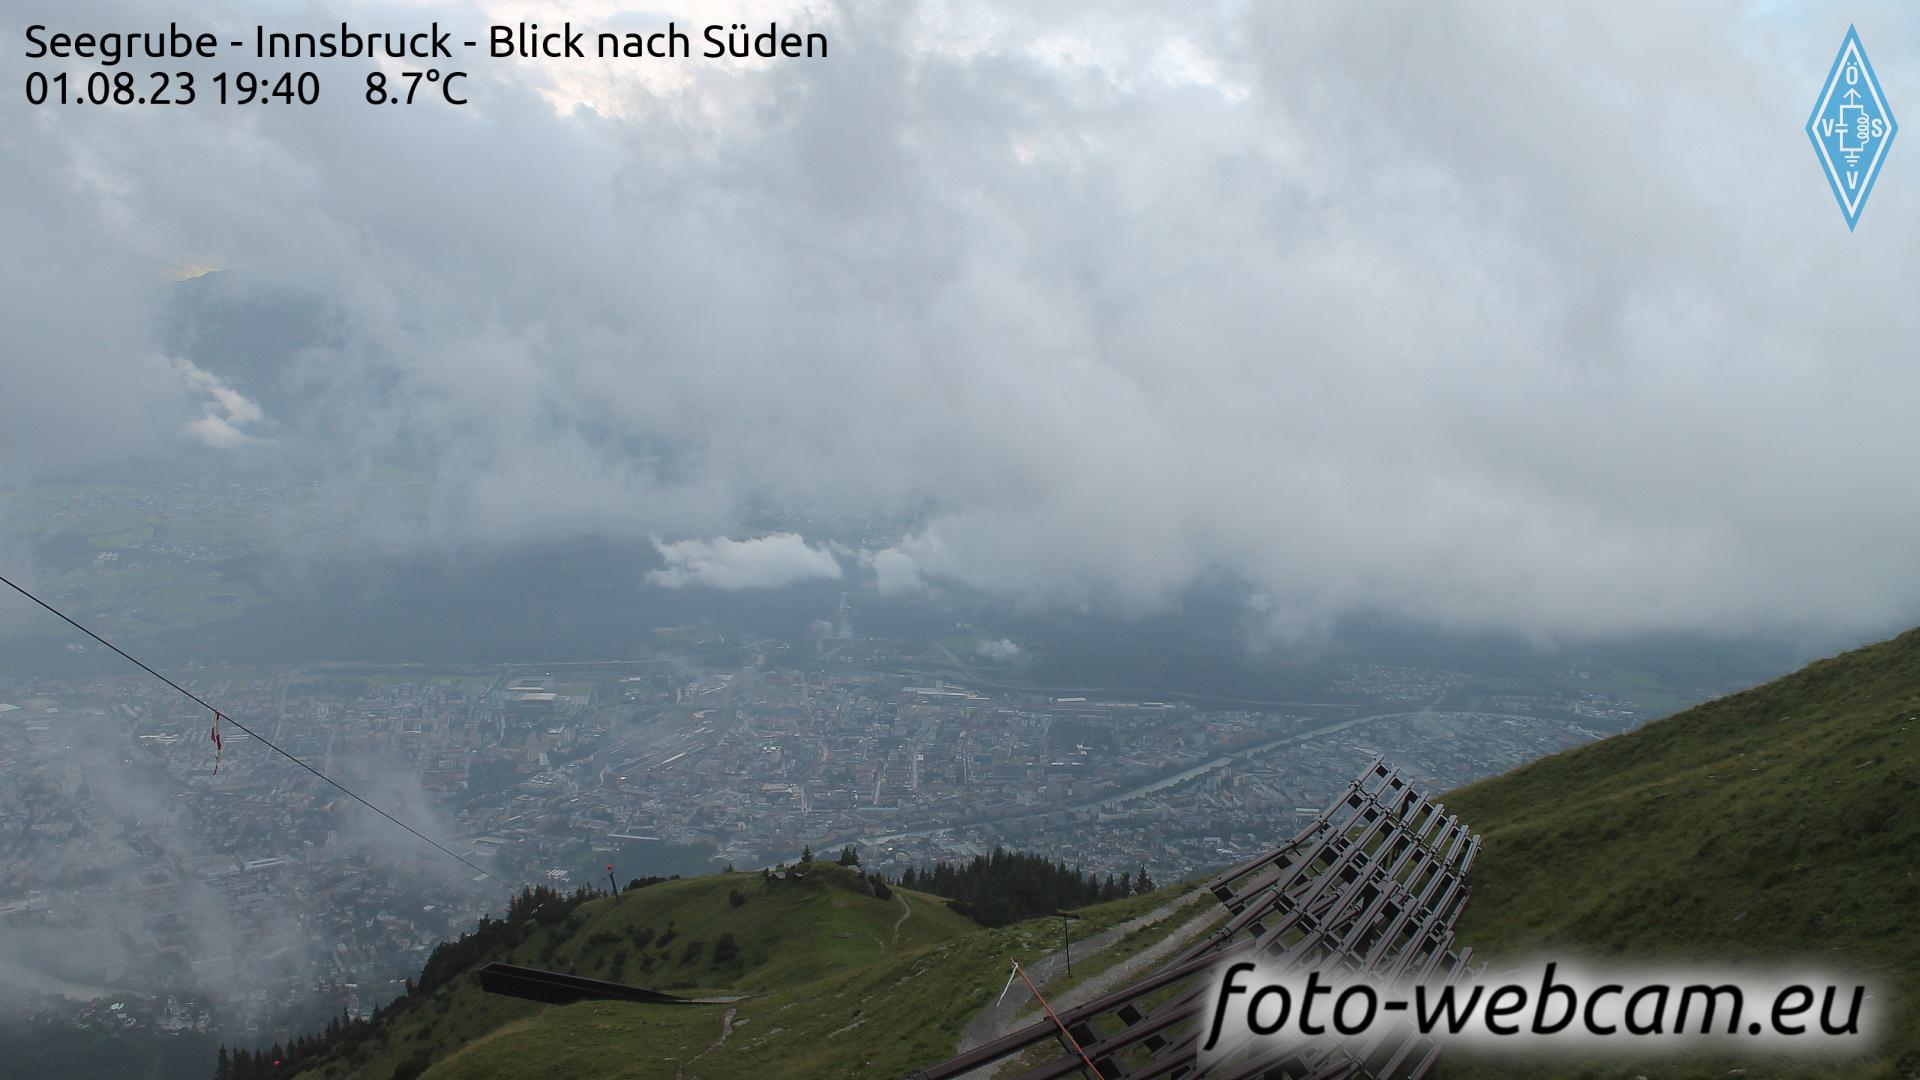 Innsbruck Wed. 19:18